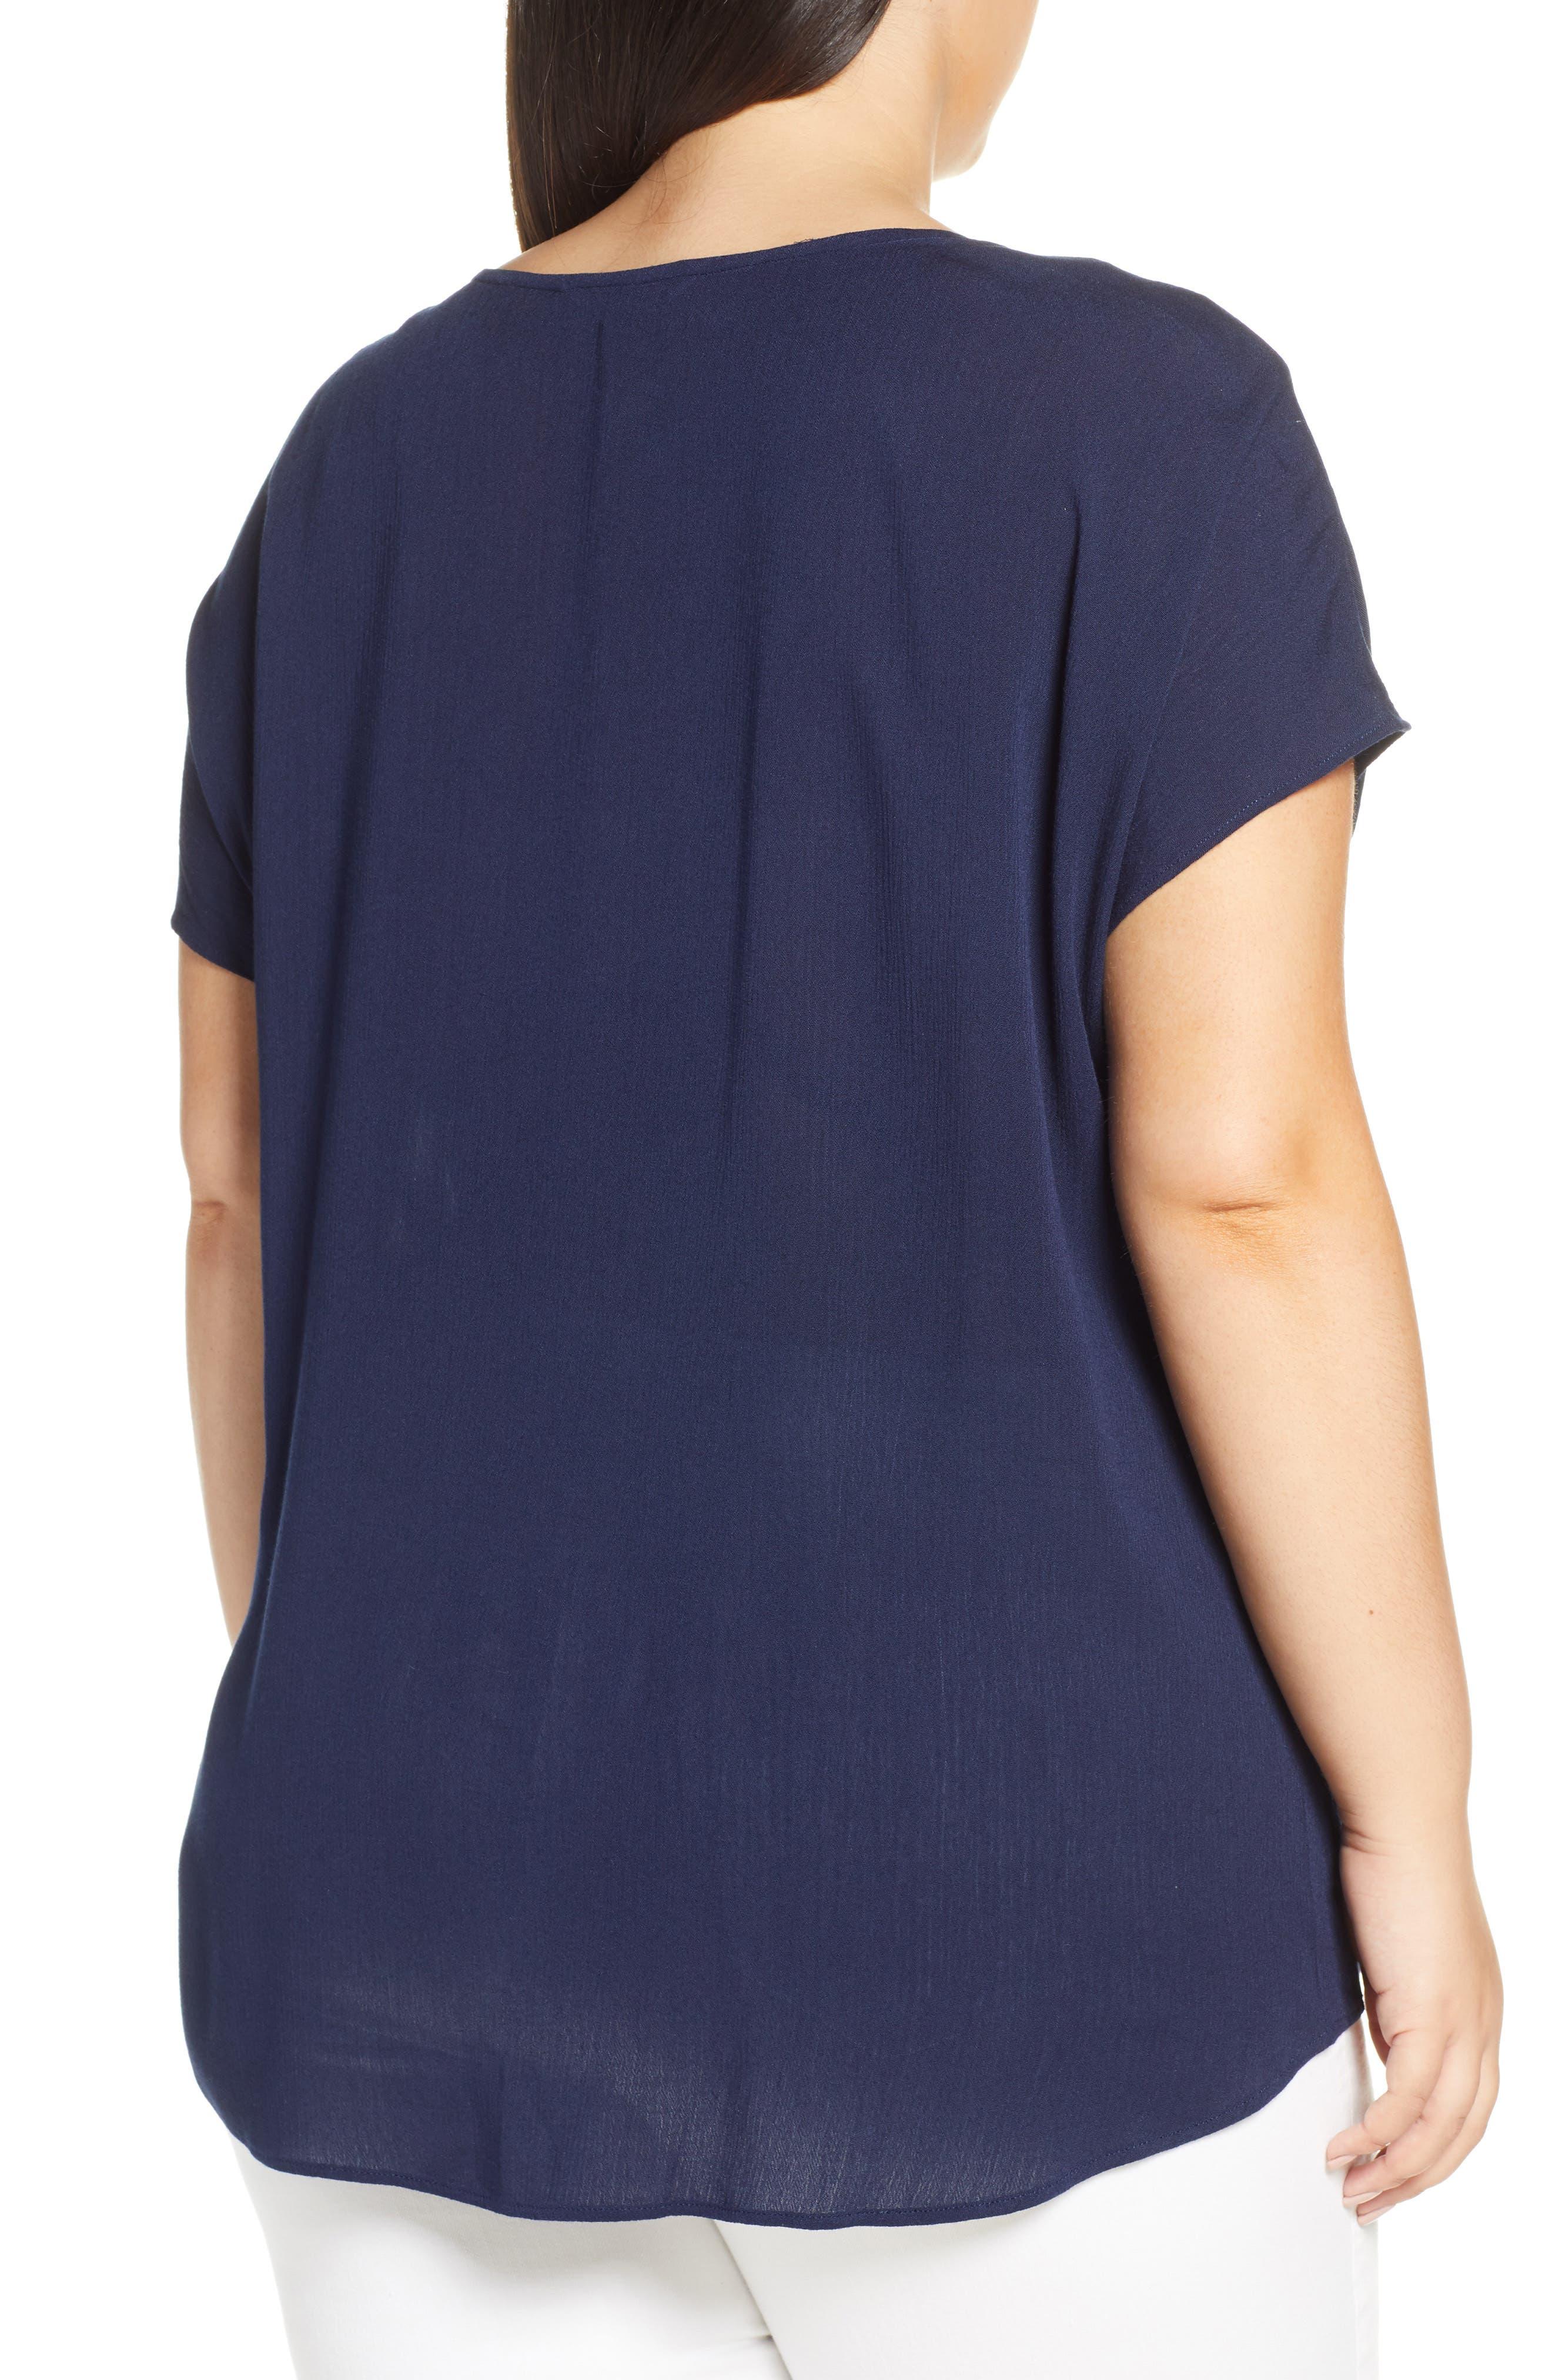 c7f692d6a4253f Women's Plus-Size Tops | Nordstrom